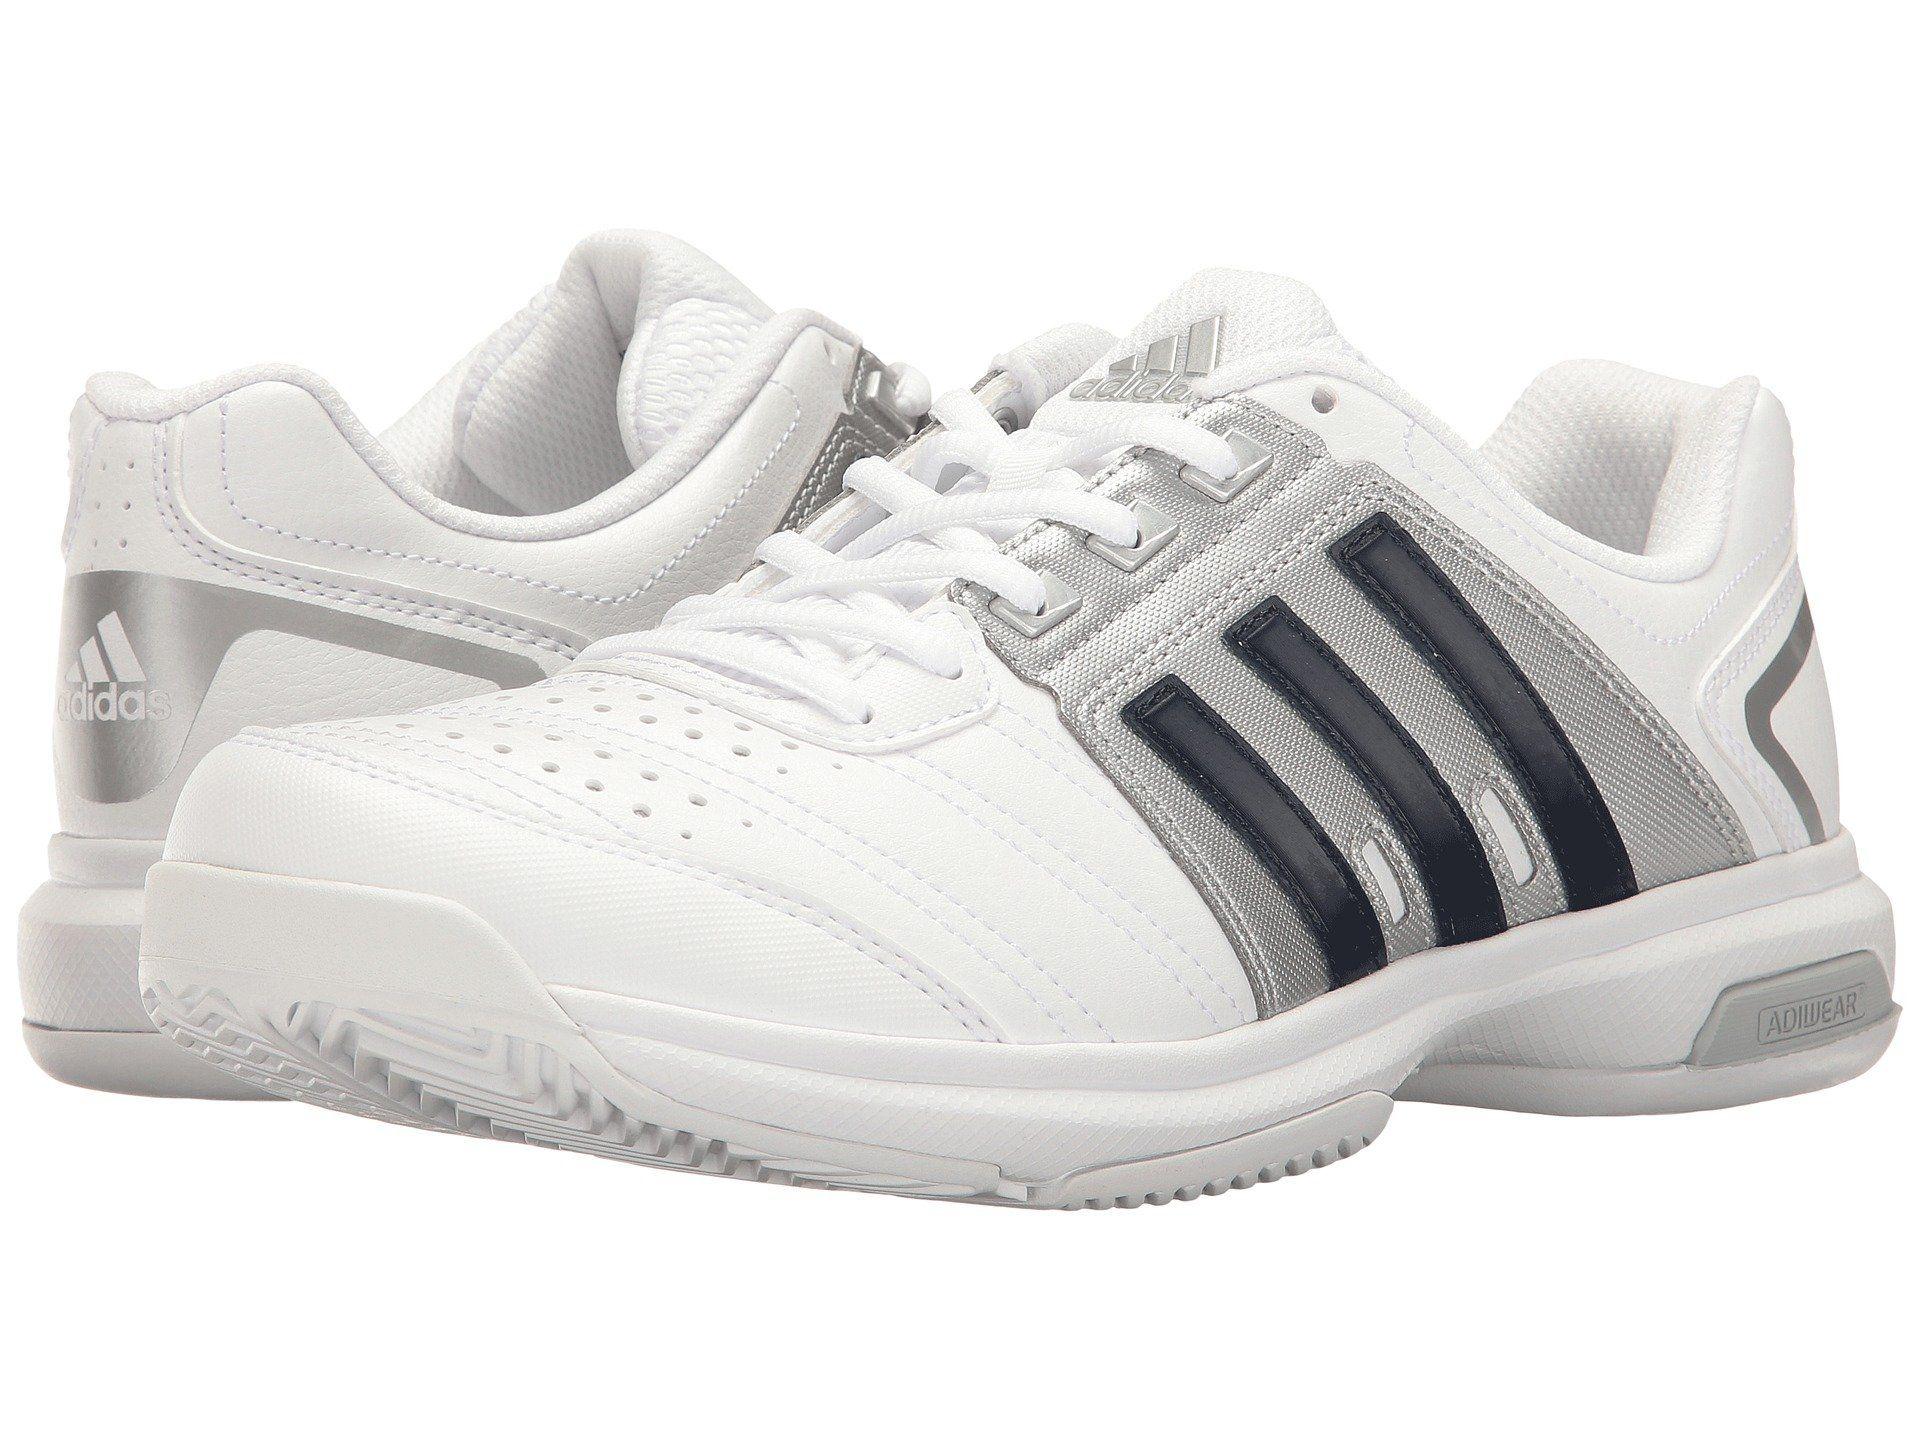 Adidas originali barricata adidasoriginals scarpe